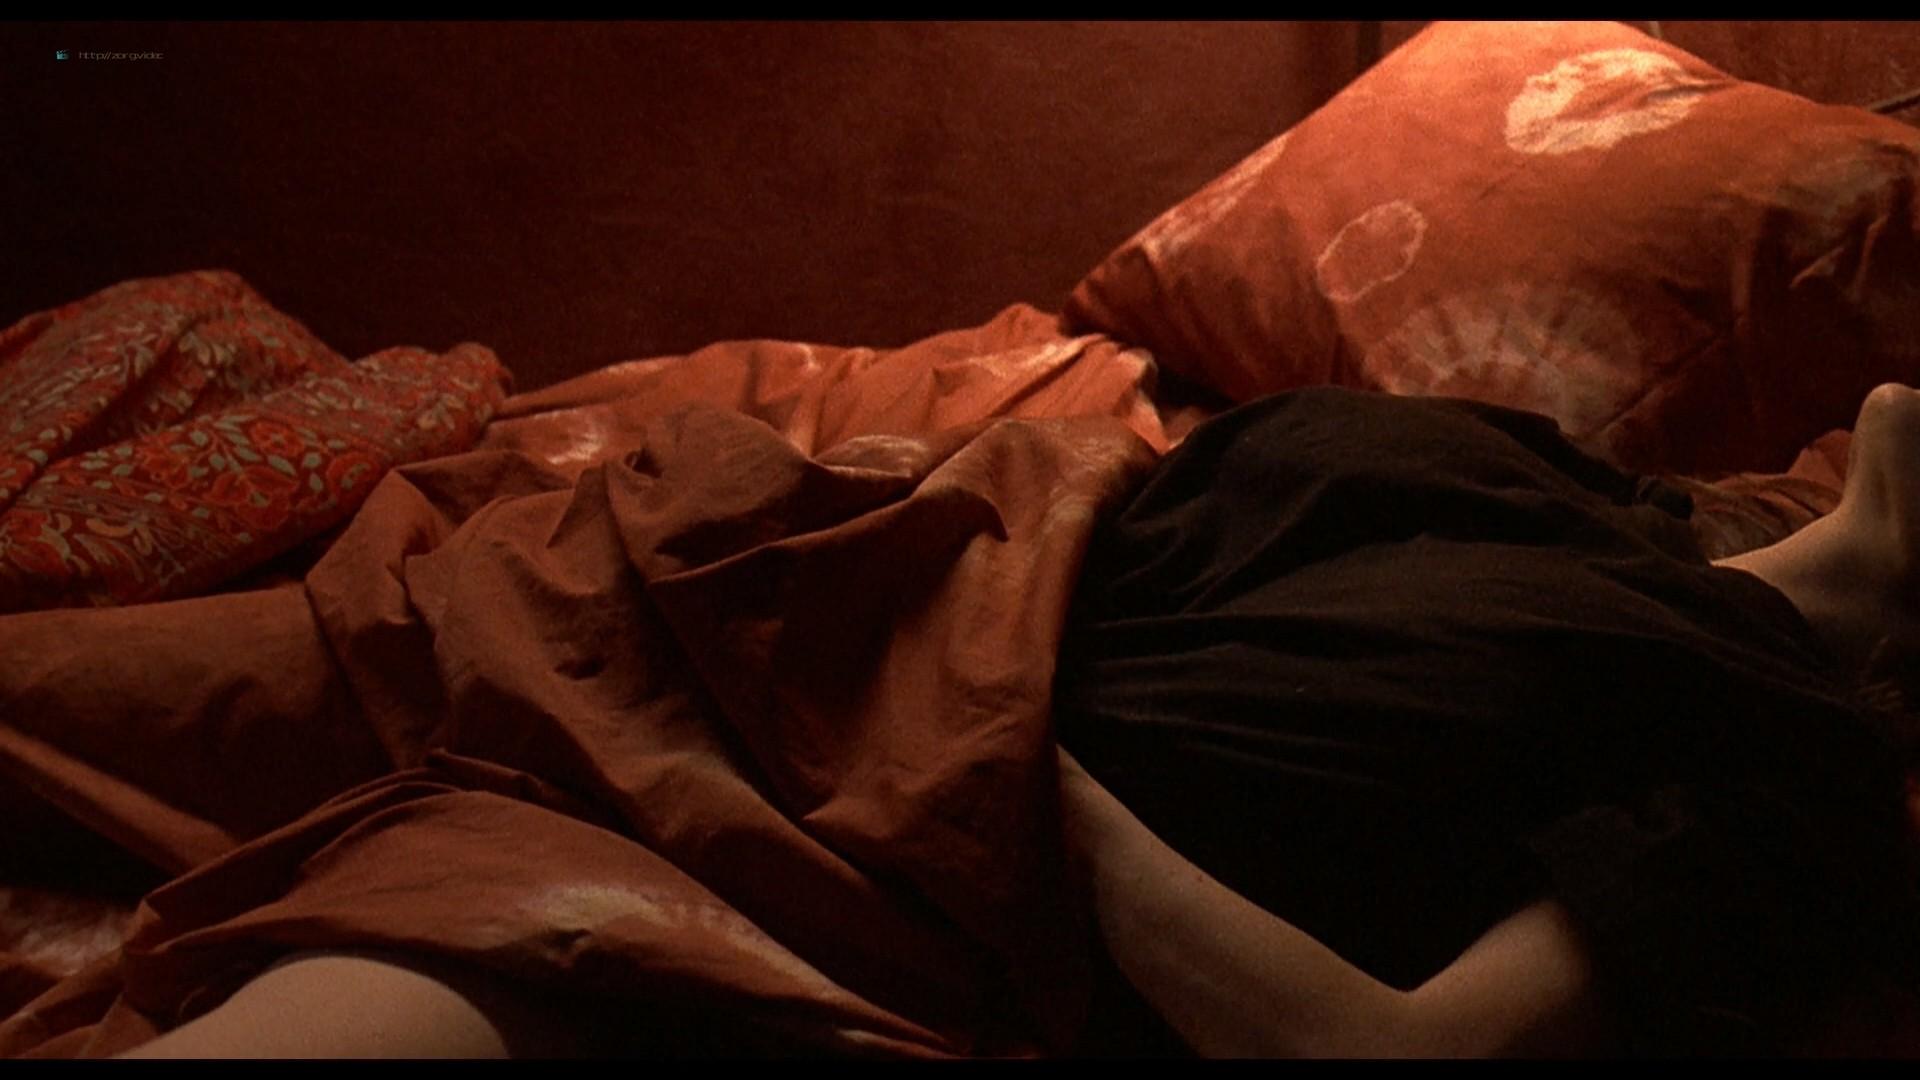 Jennifer Connelly nude side boob sex in – Waking the Dead (2000) HD 1080p BluRay (12)